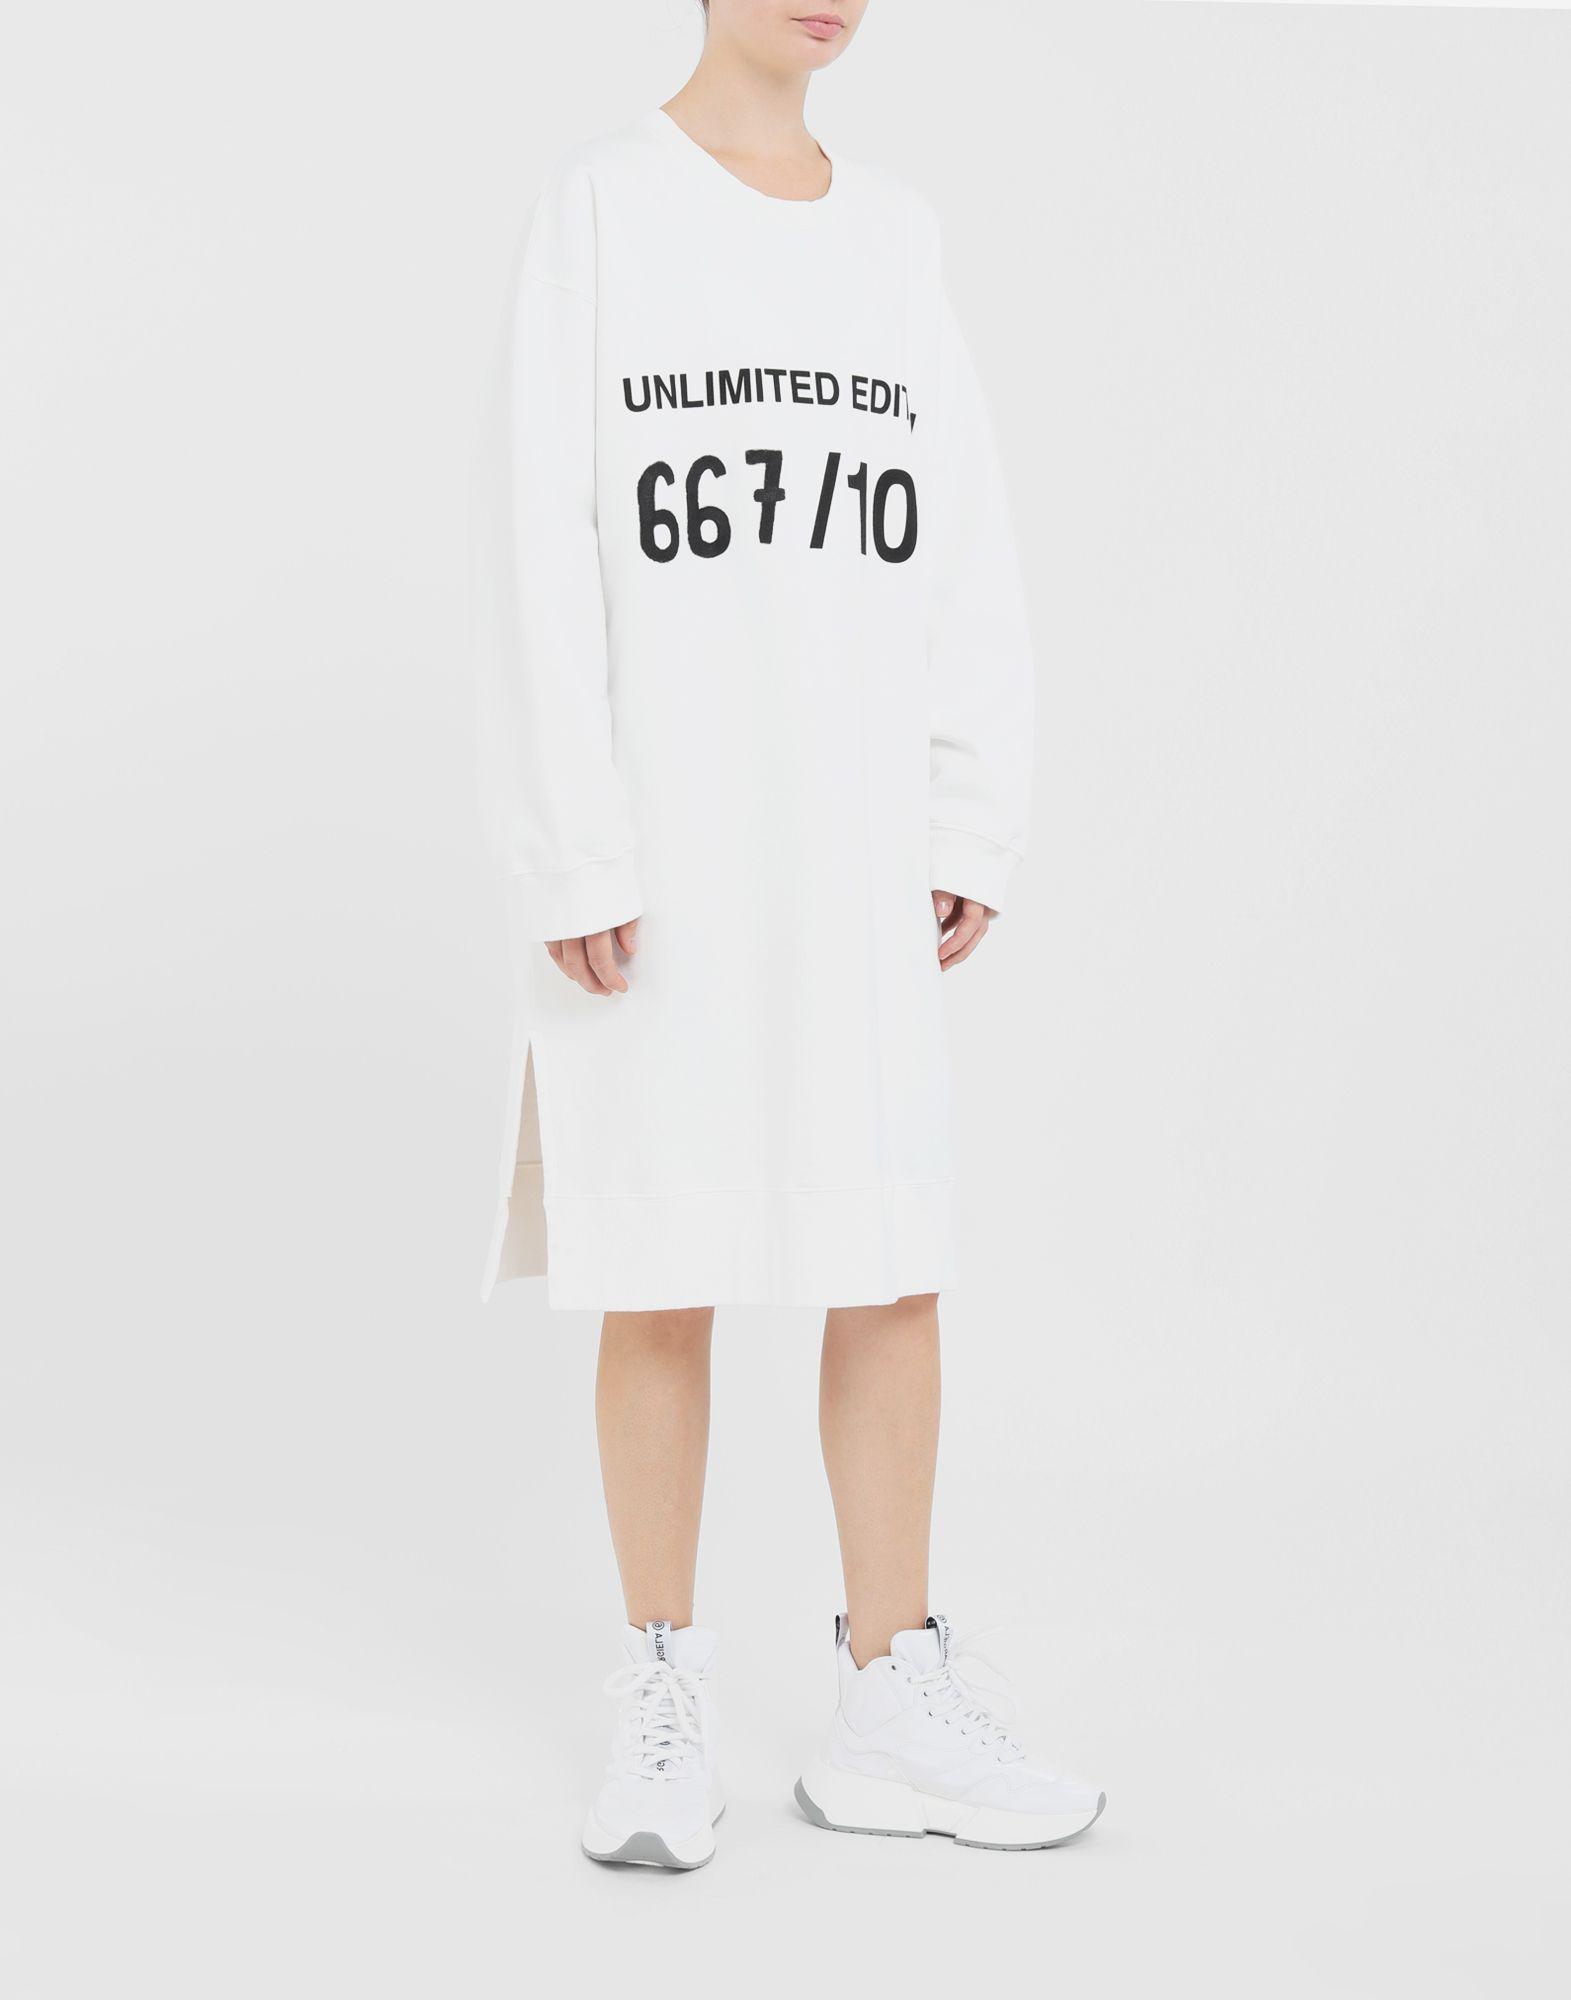 MM6 MAISON MARGIELA Unlimited Edition dress Dress Woman r